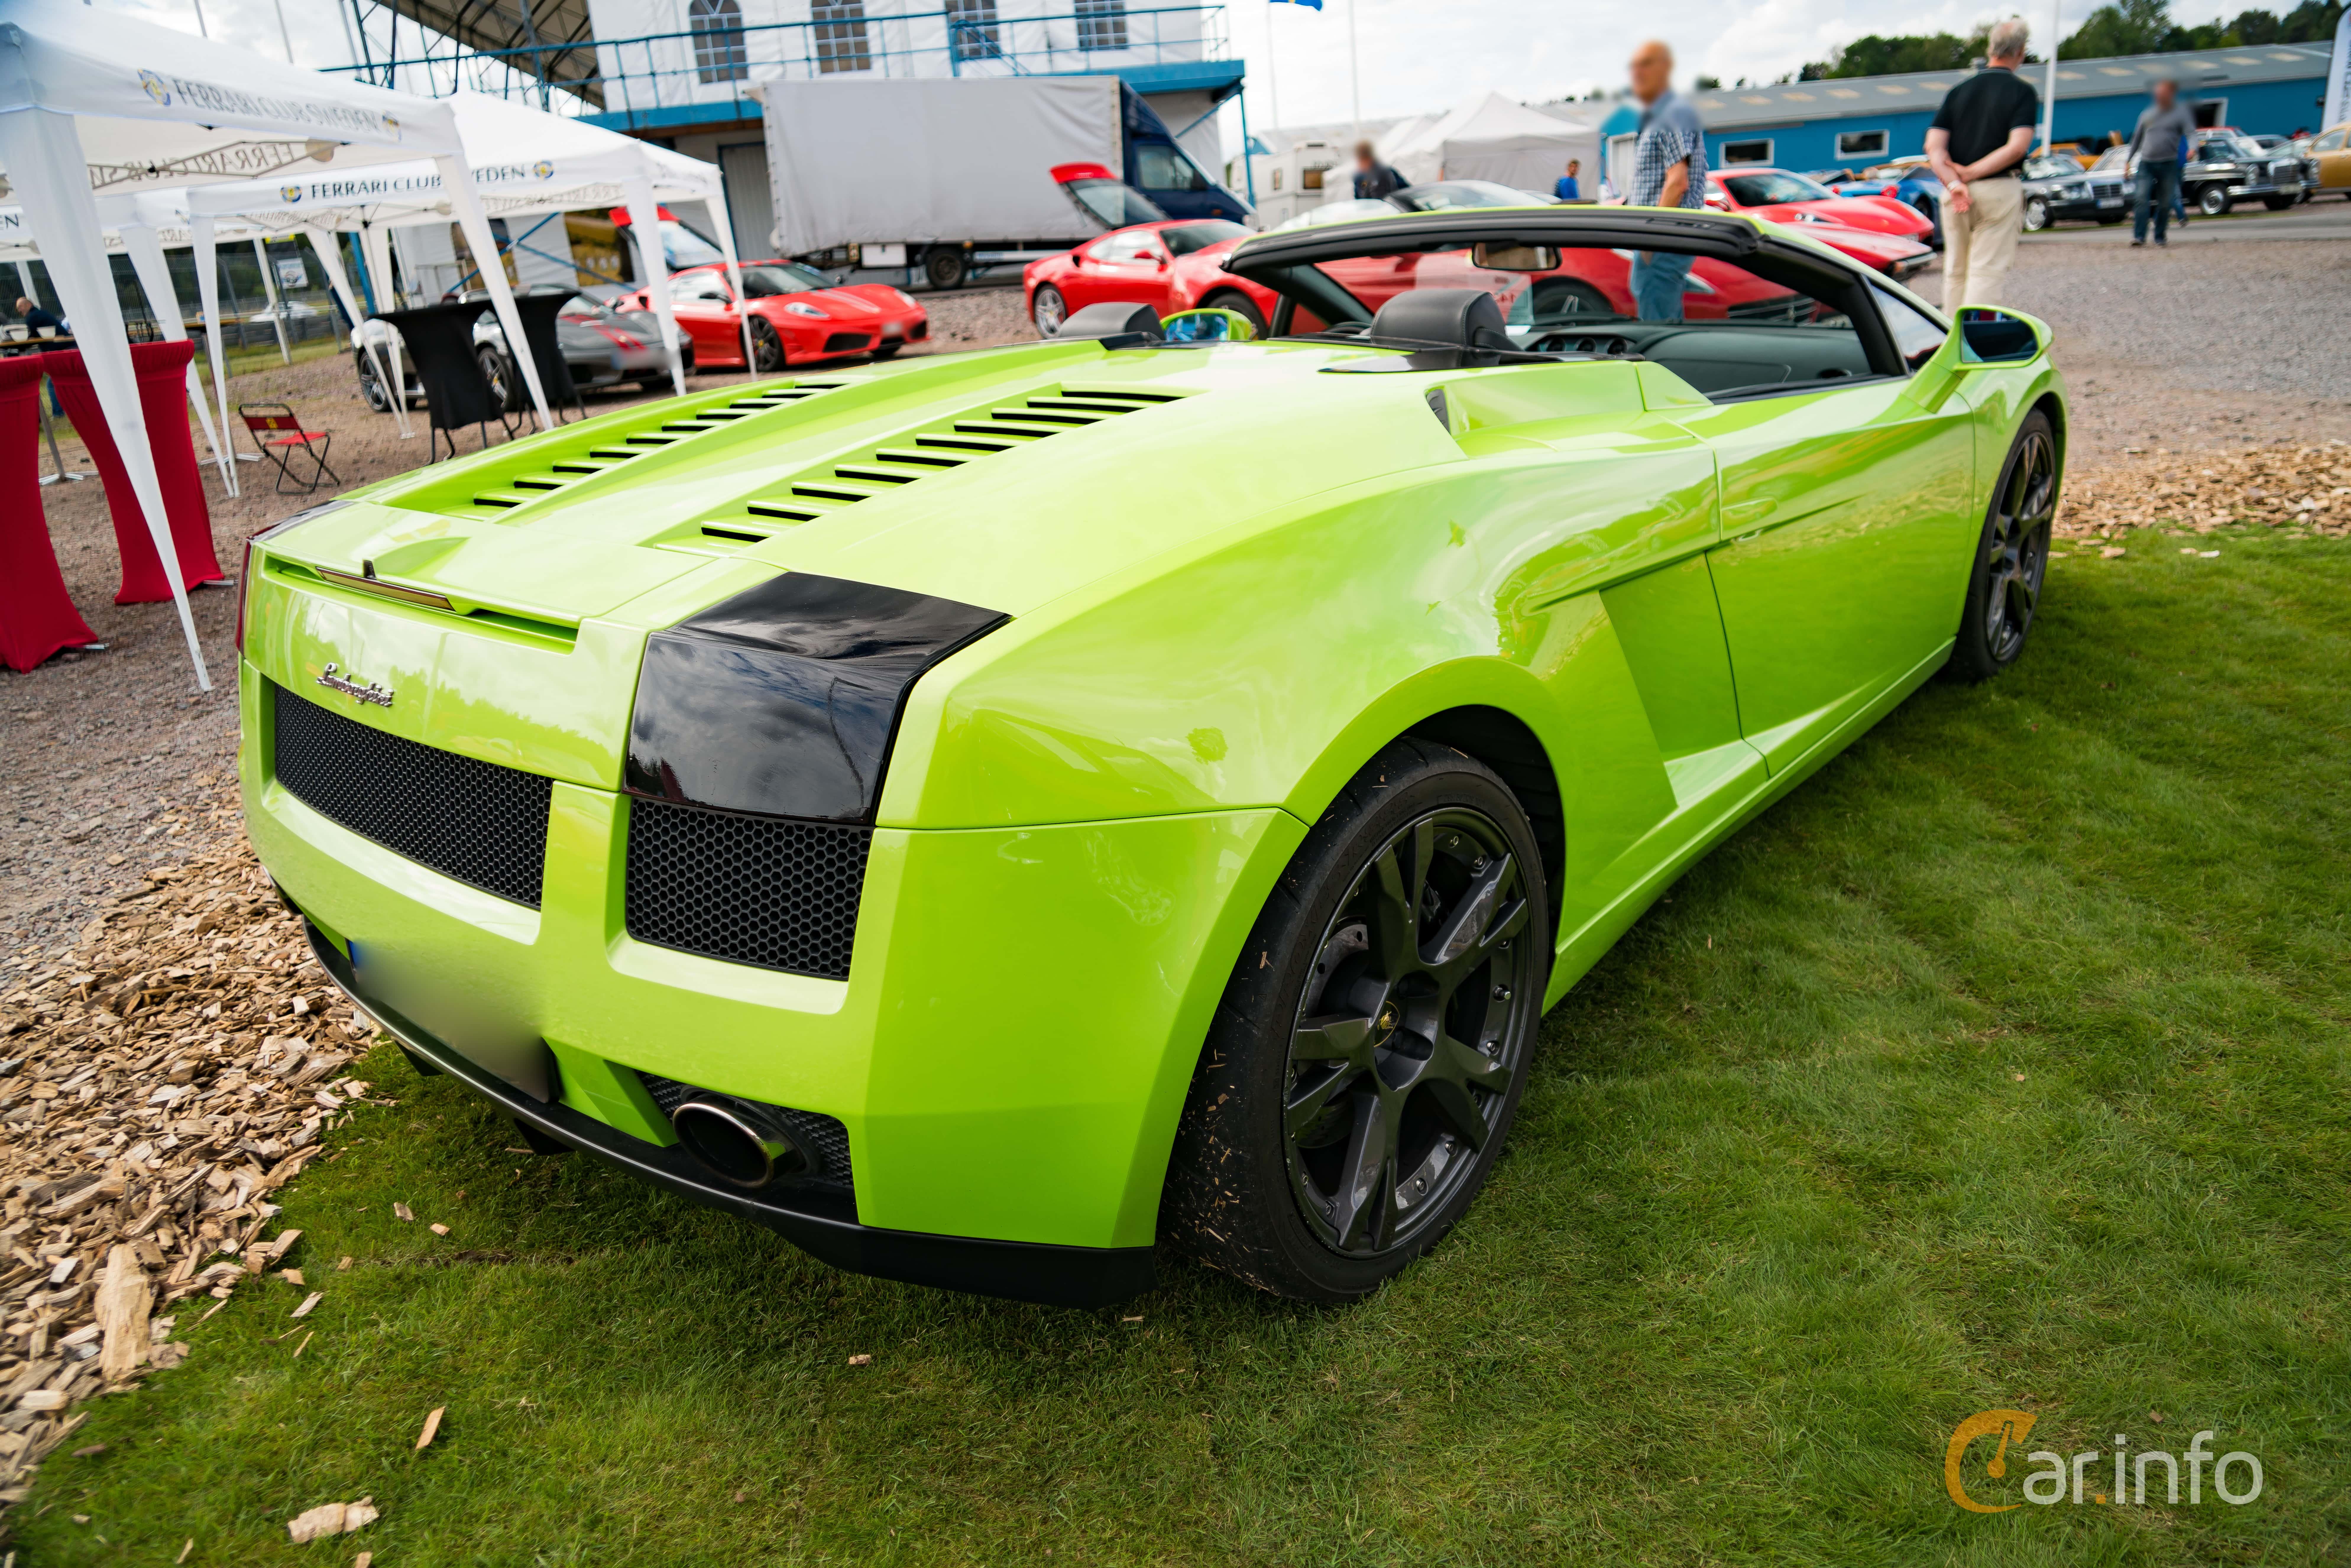 High Quality Cars Police Lamborghini Back View Vehicles Lamborghini